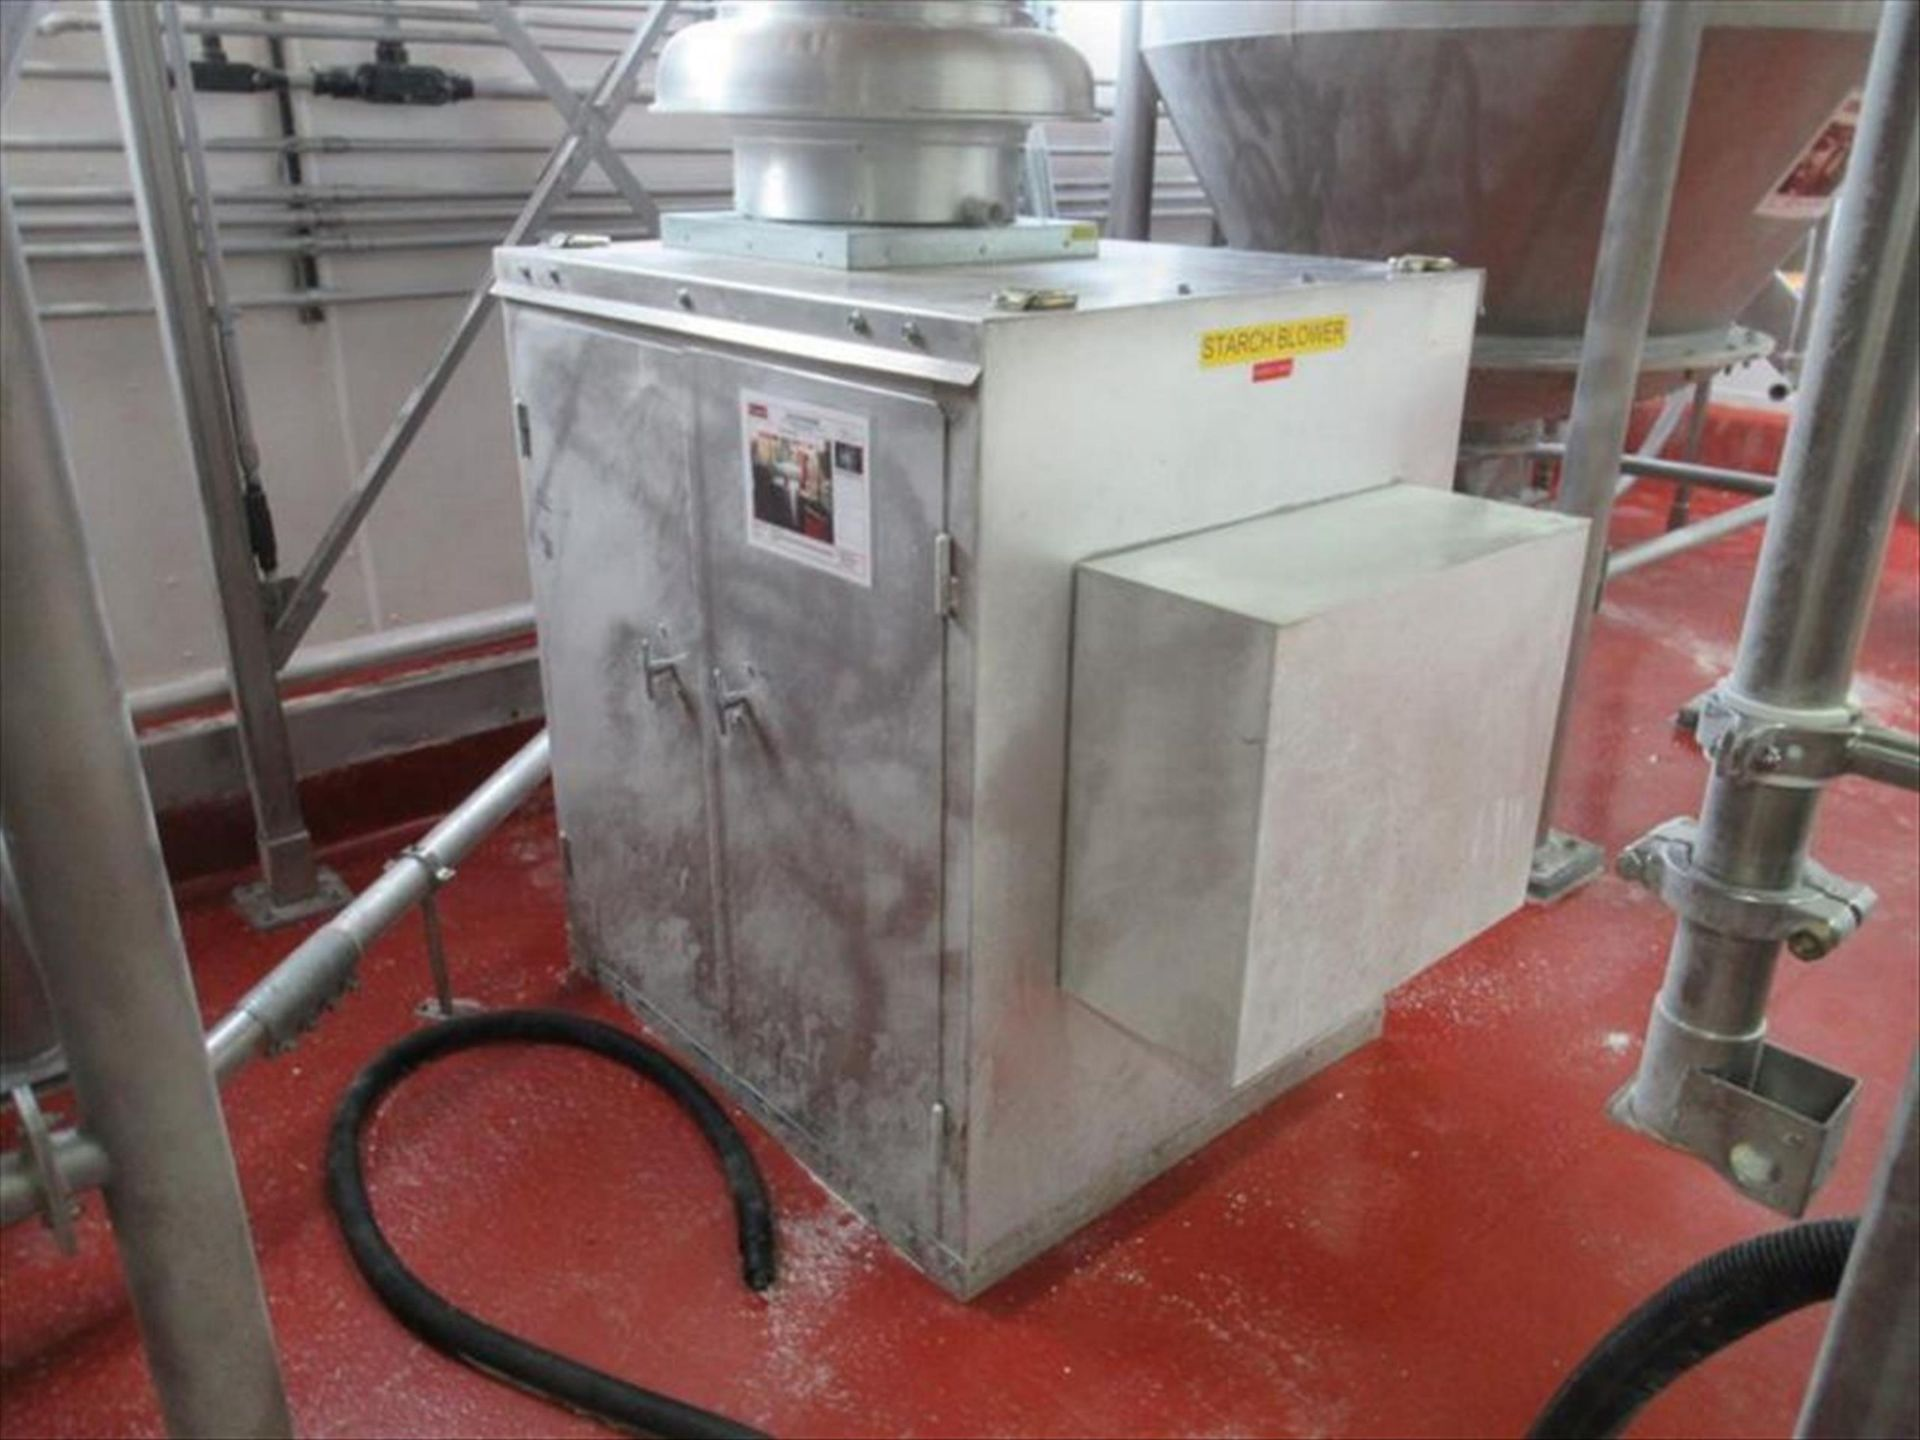 Lot 331 - Dresser Roots vacuum blower mod. no. 404 Ram ser. no. 1204949849 rotary lobe positive blower,